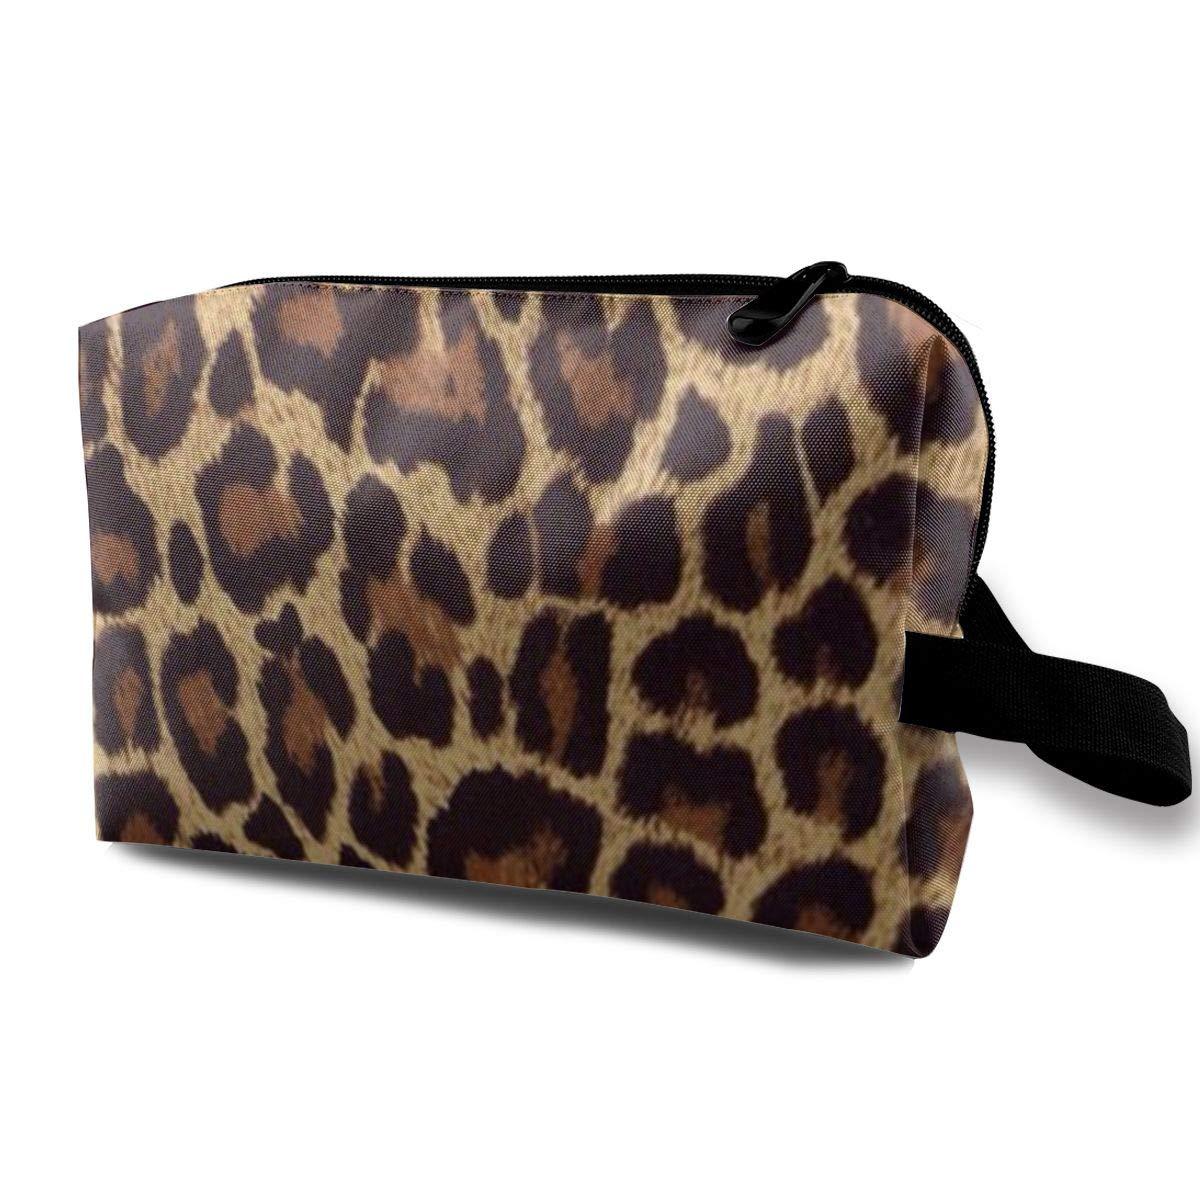 Makeup Bag Cosmetic Toiletry Travel Bag Cool Cheetah Leopard Organizer Pouch For Women Men